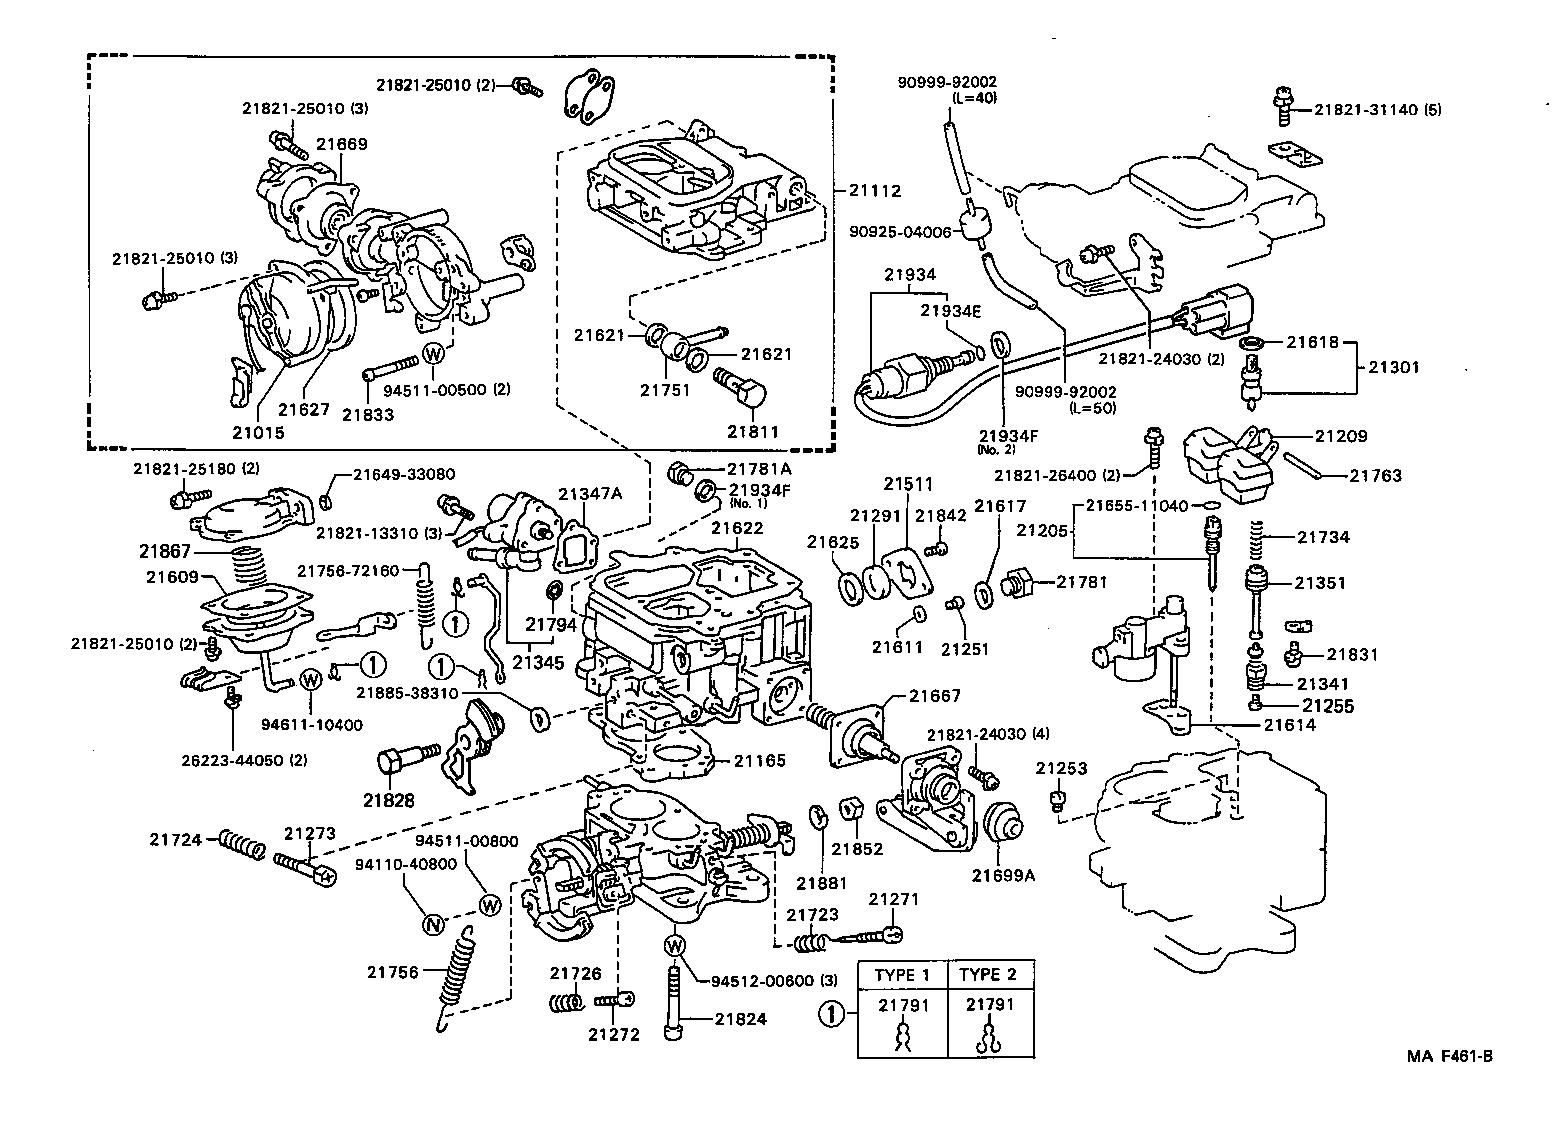 1994 toyota engine wiring diagram os 2317  toyota hiace wiring diagram 1994 free diagram  toyota hiace wiring diagram 1994 free